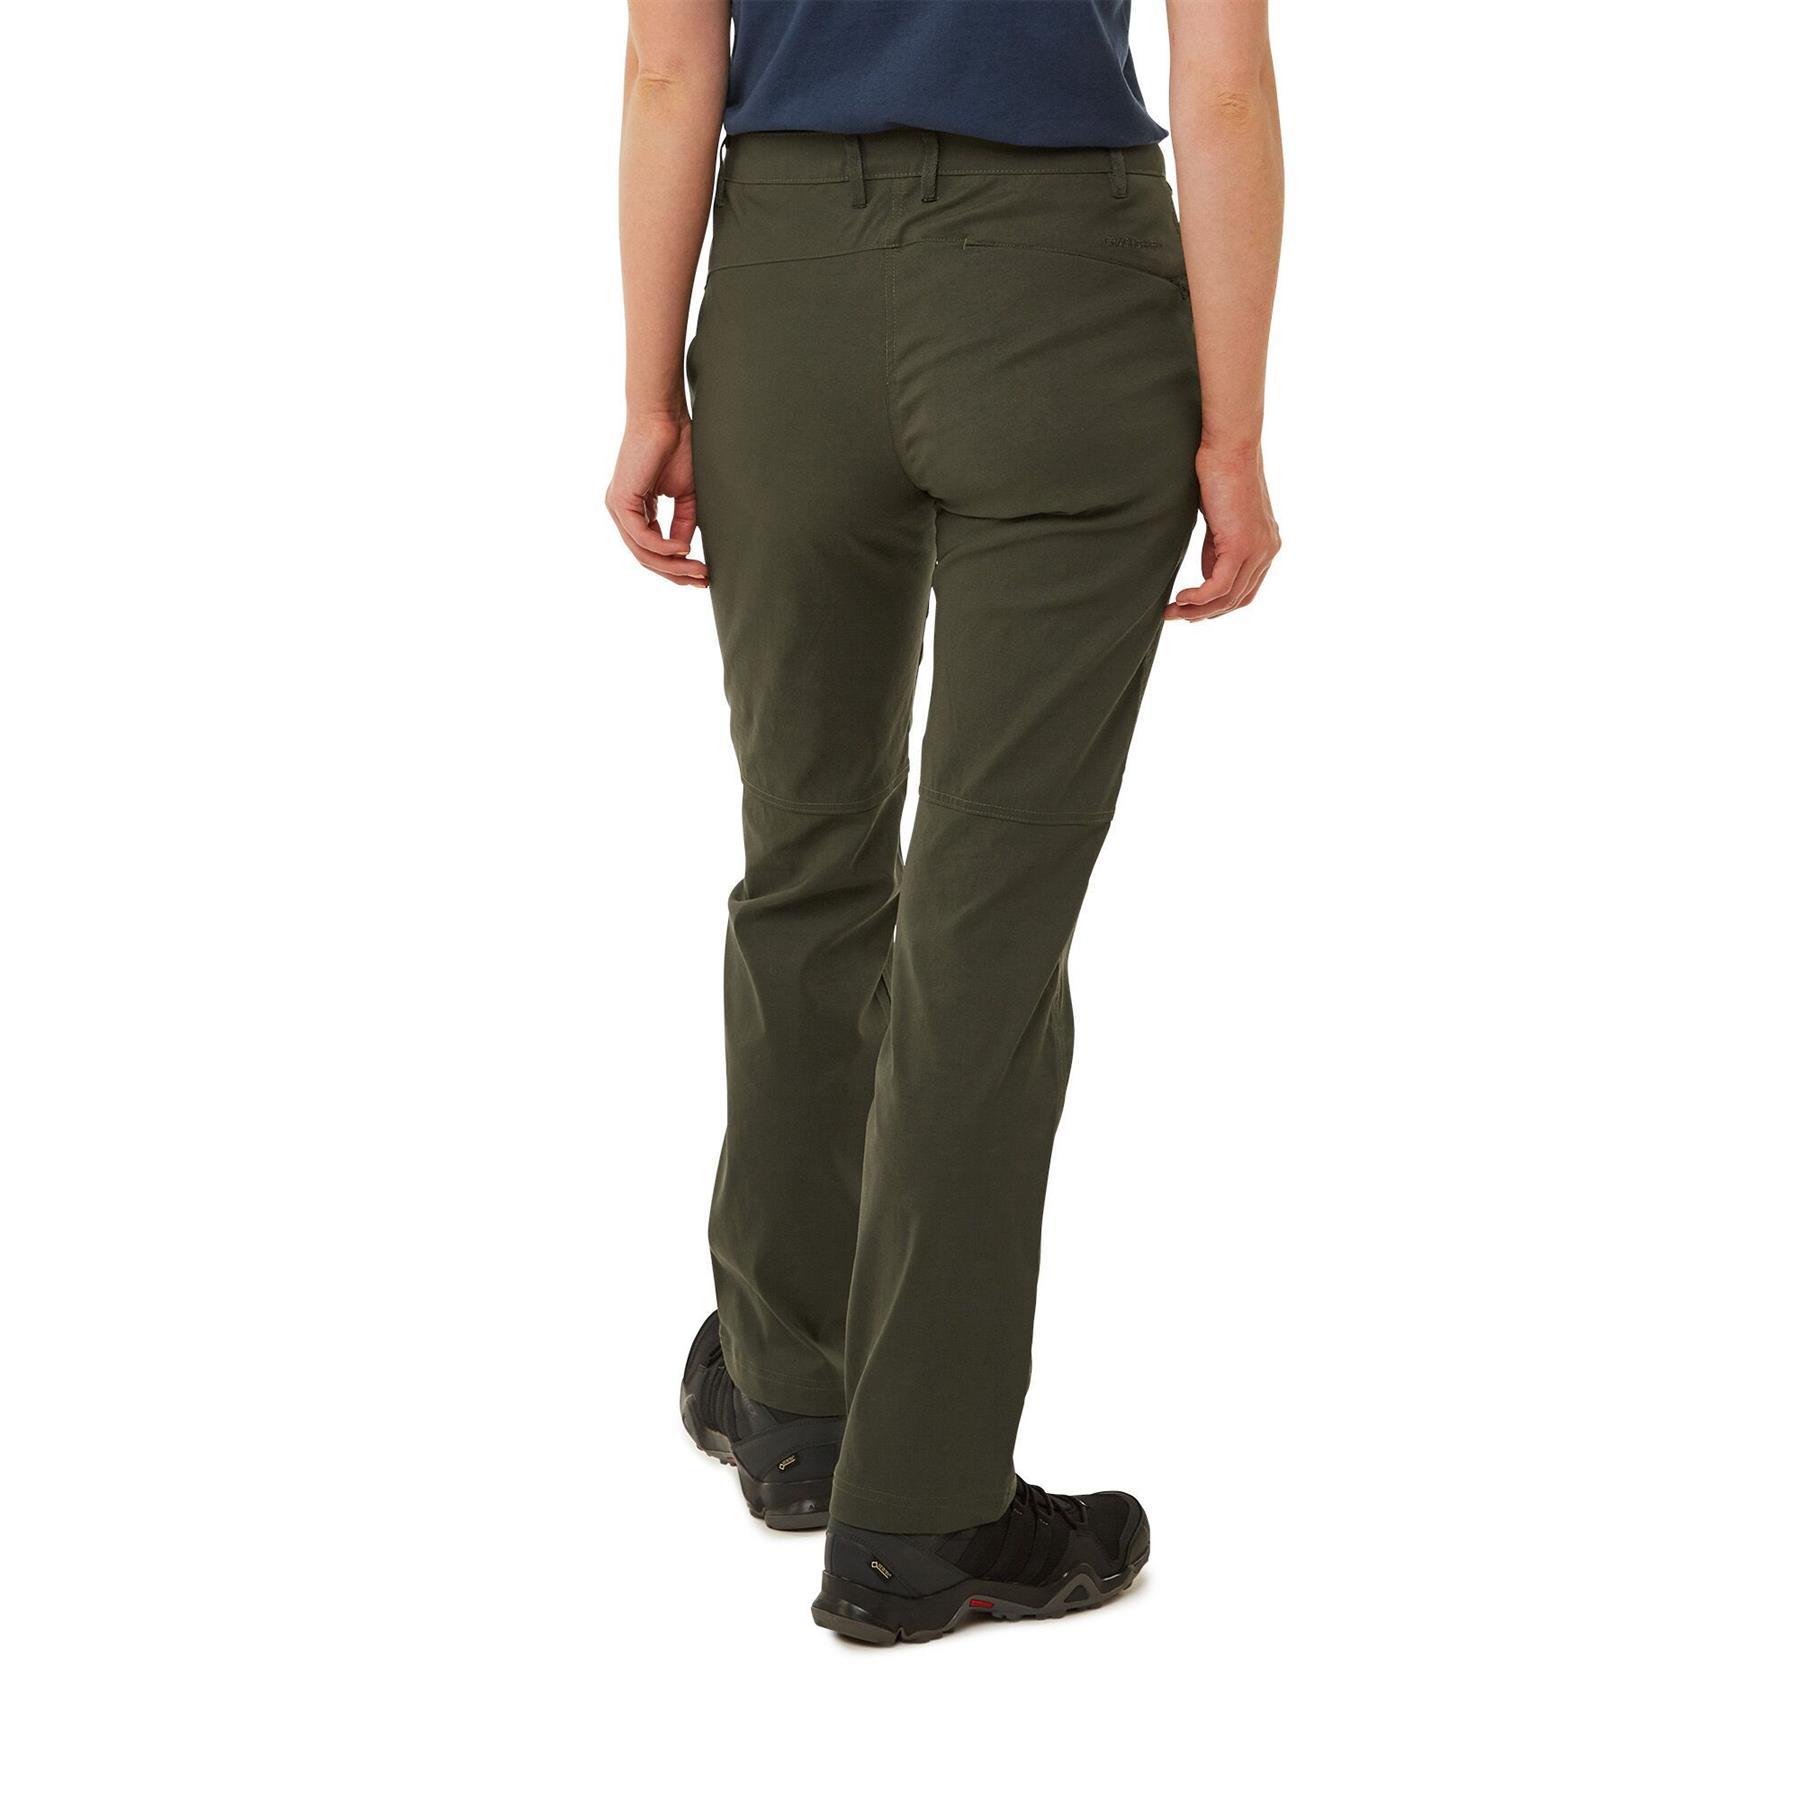 New Craghoppers Womens Kiwi Pro II Full Stretch Trousers Outdoor Walking CWJ1202